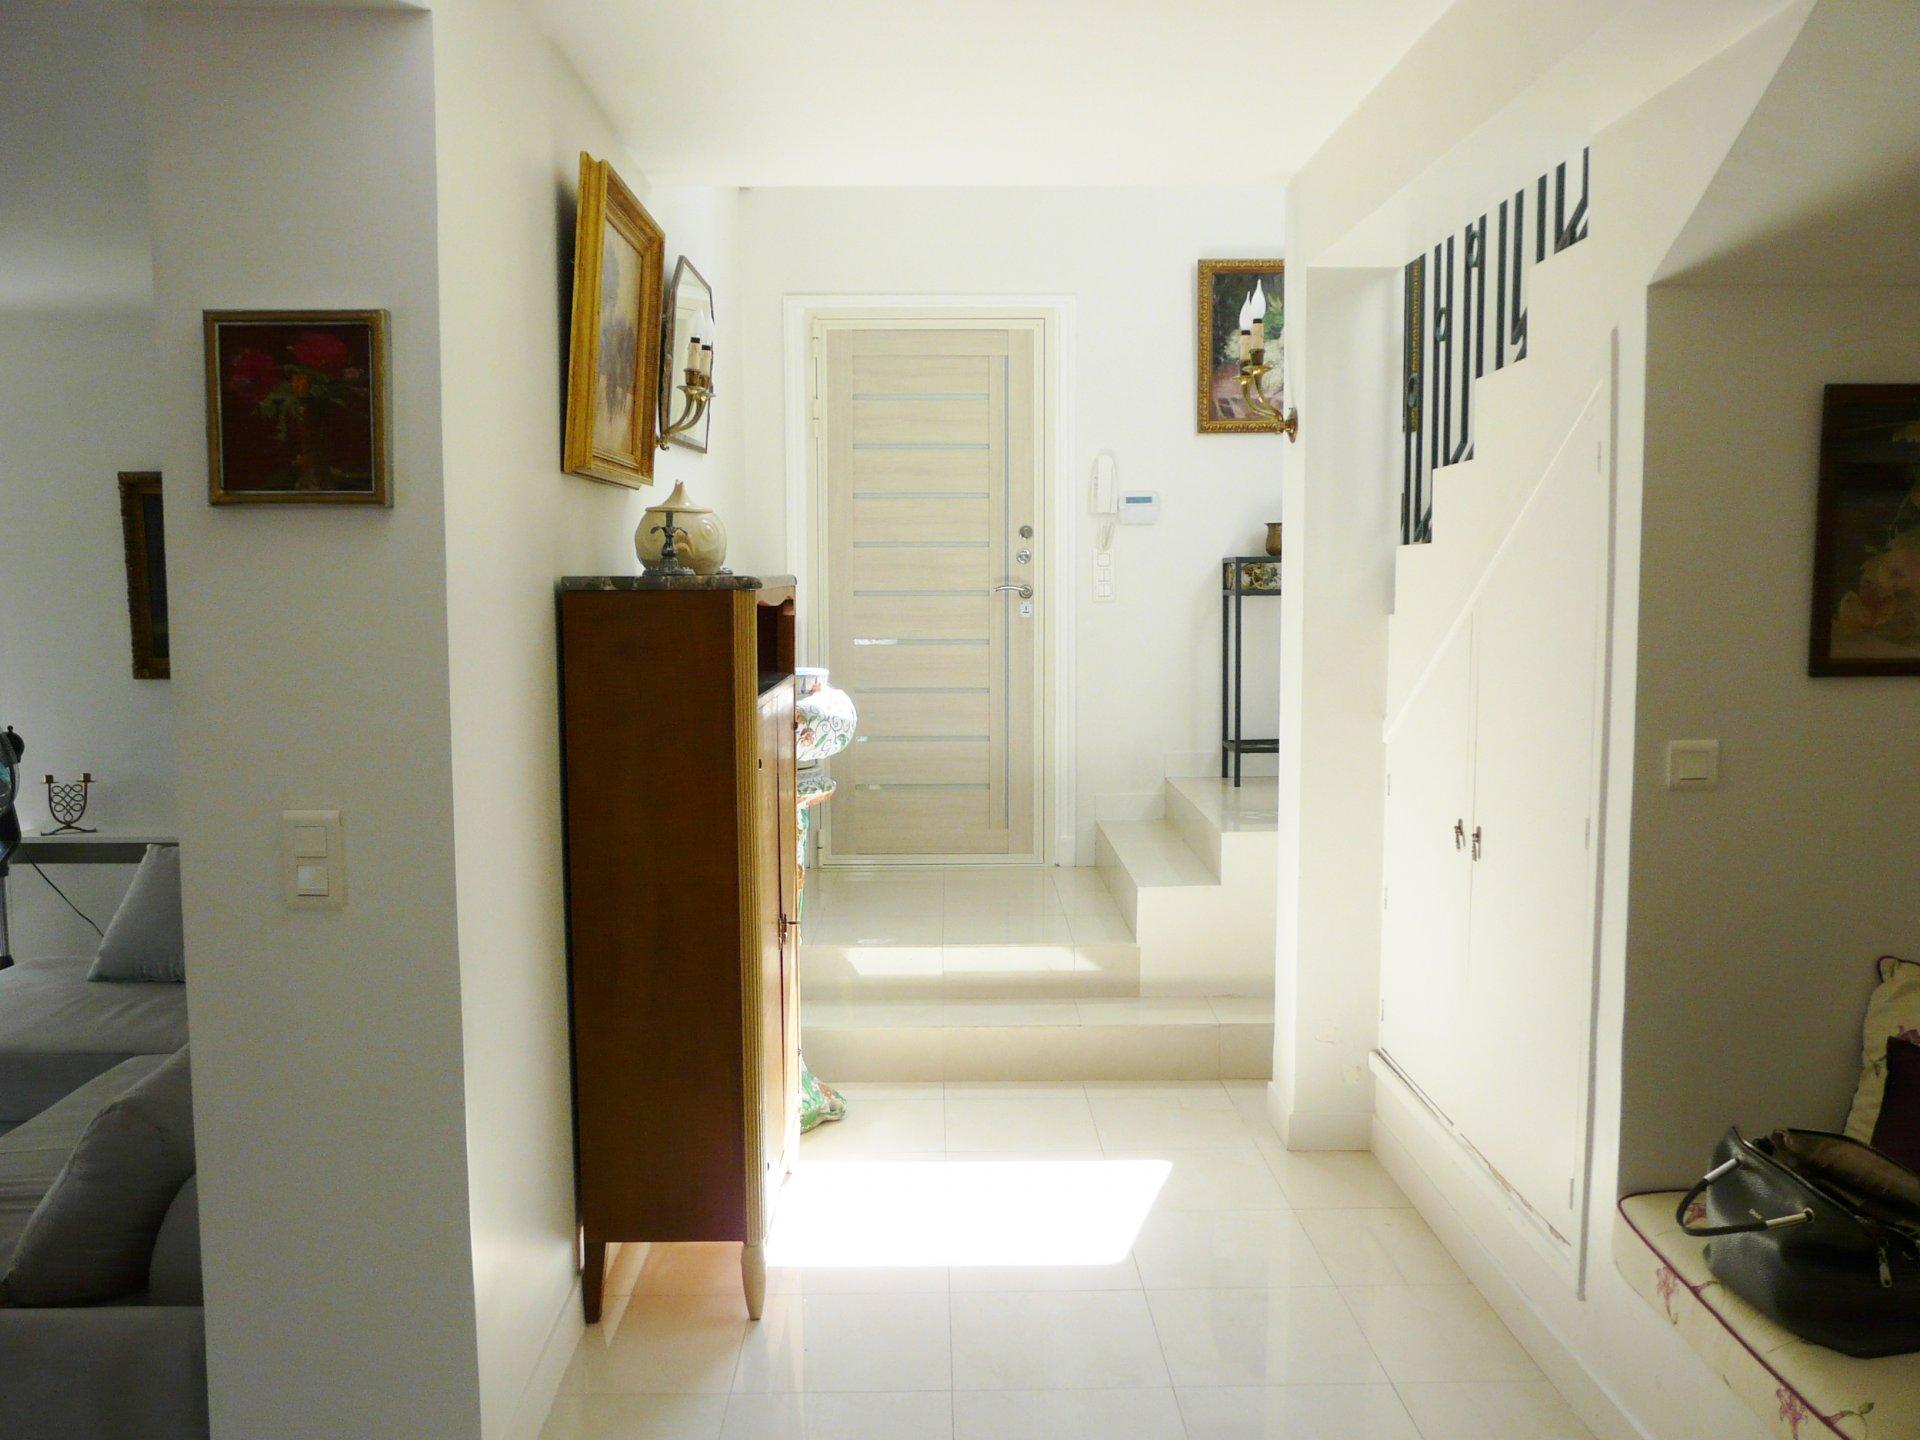 Hallway, tile